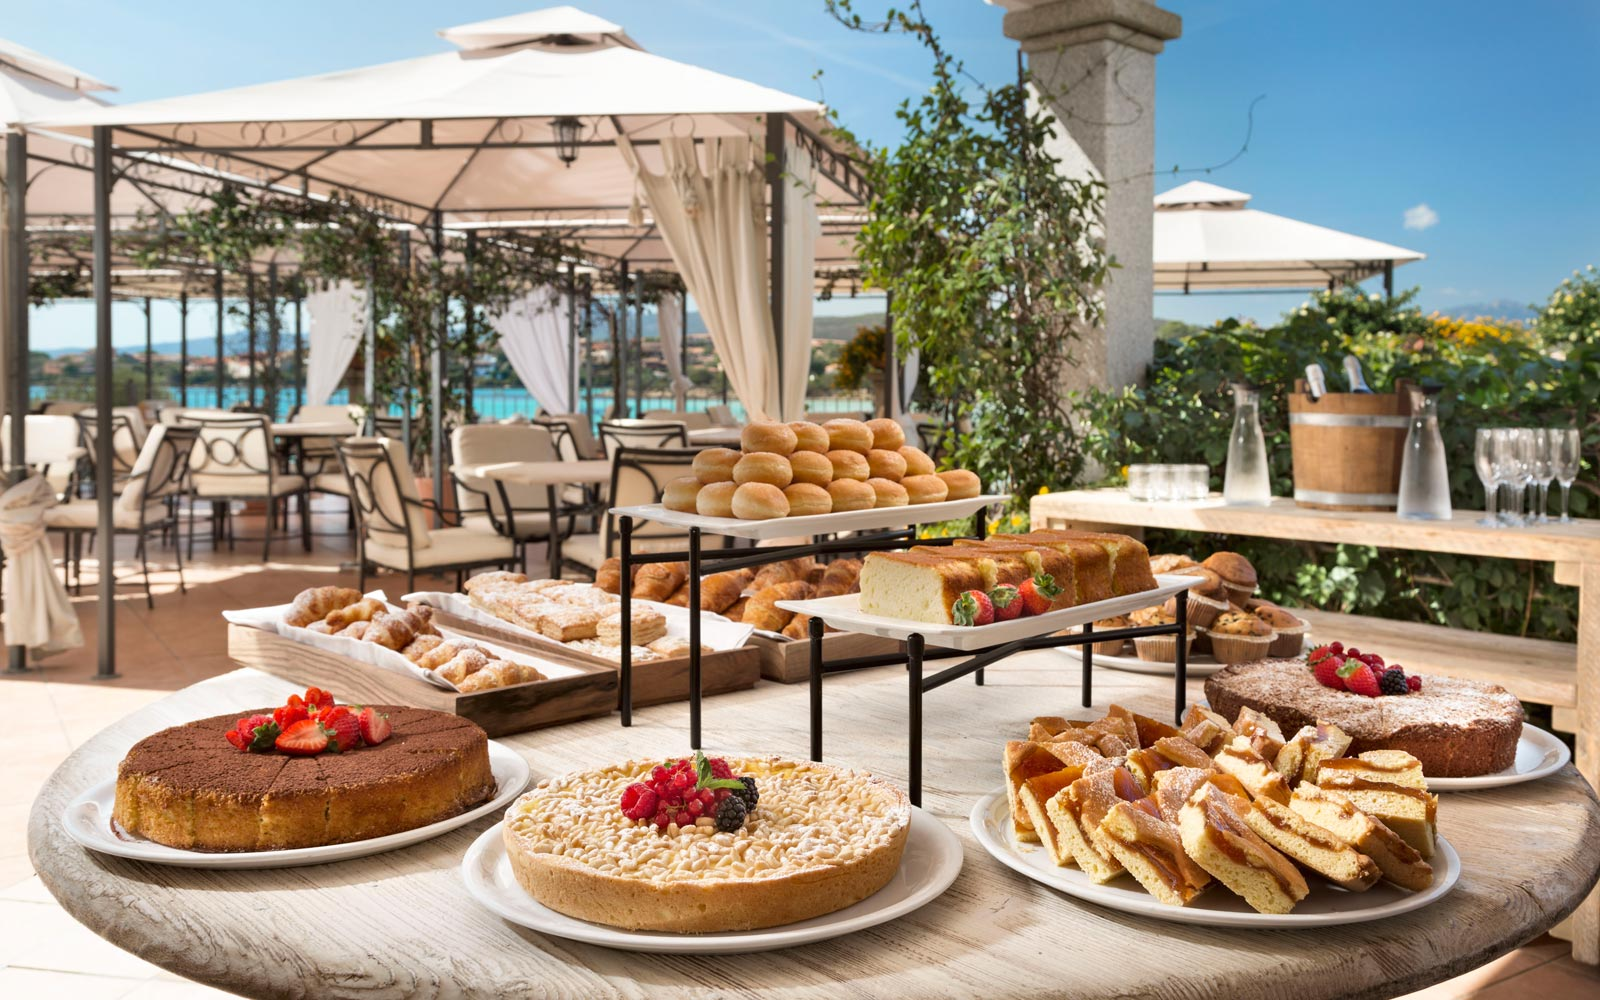 Breakfast at Gabbiano Azzurro Hotel & Suites